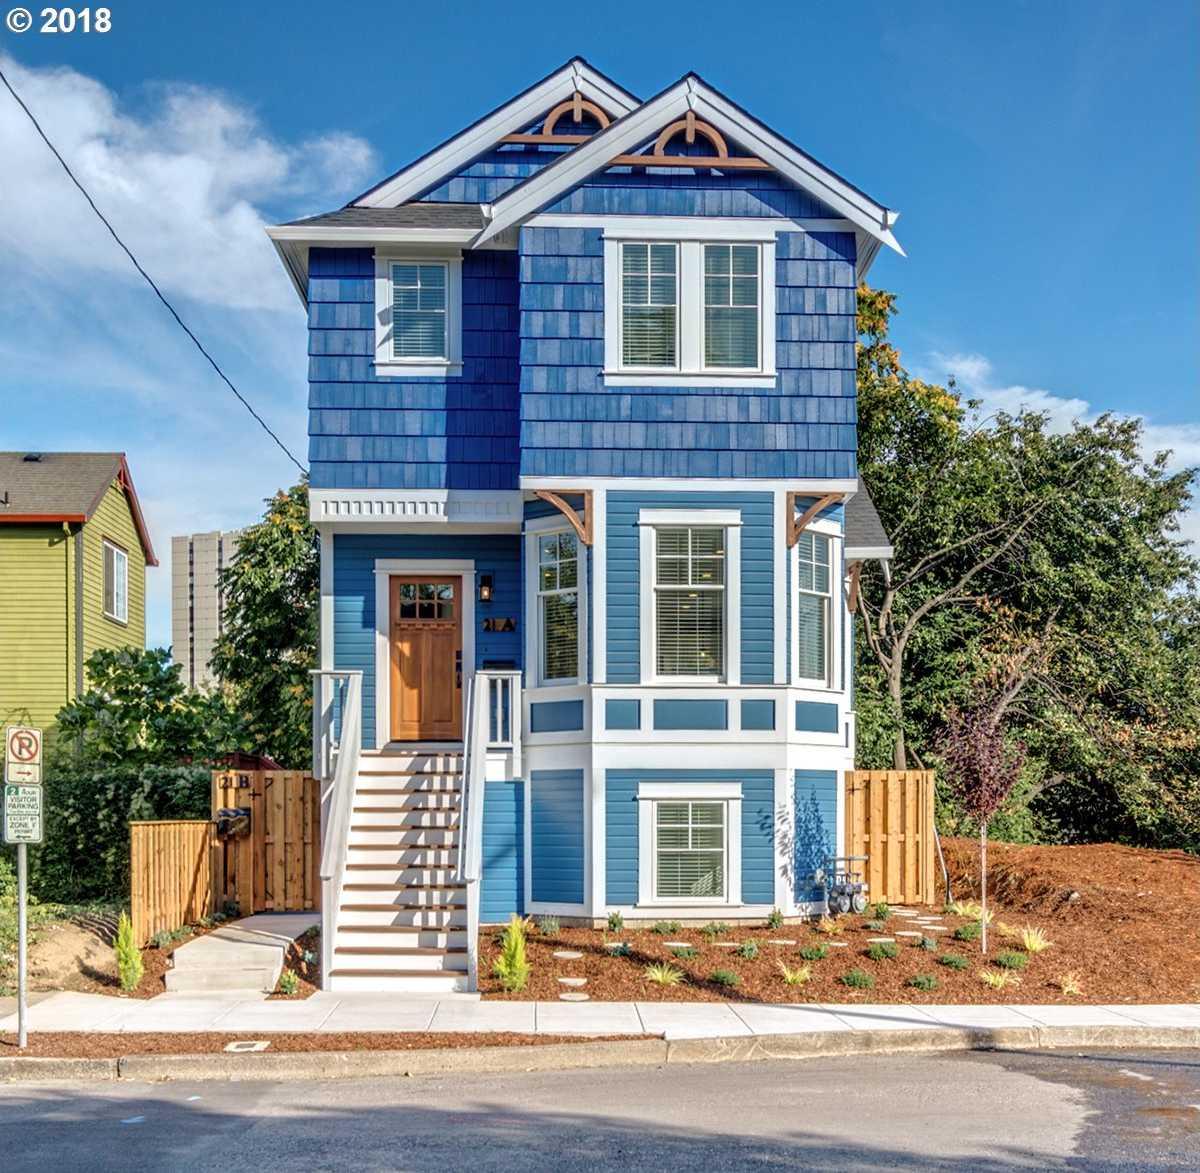 $639,900 - Br/Ba -  for Sale in South Portland, Portland